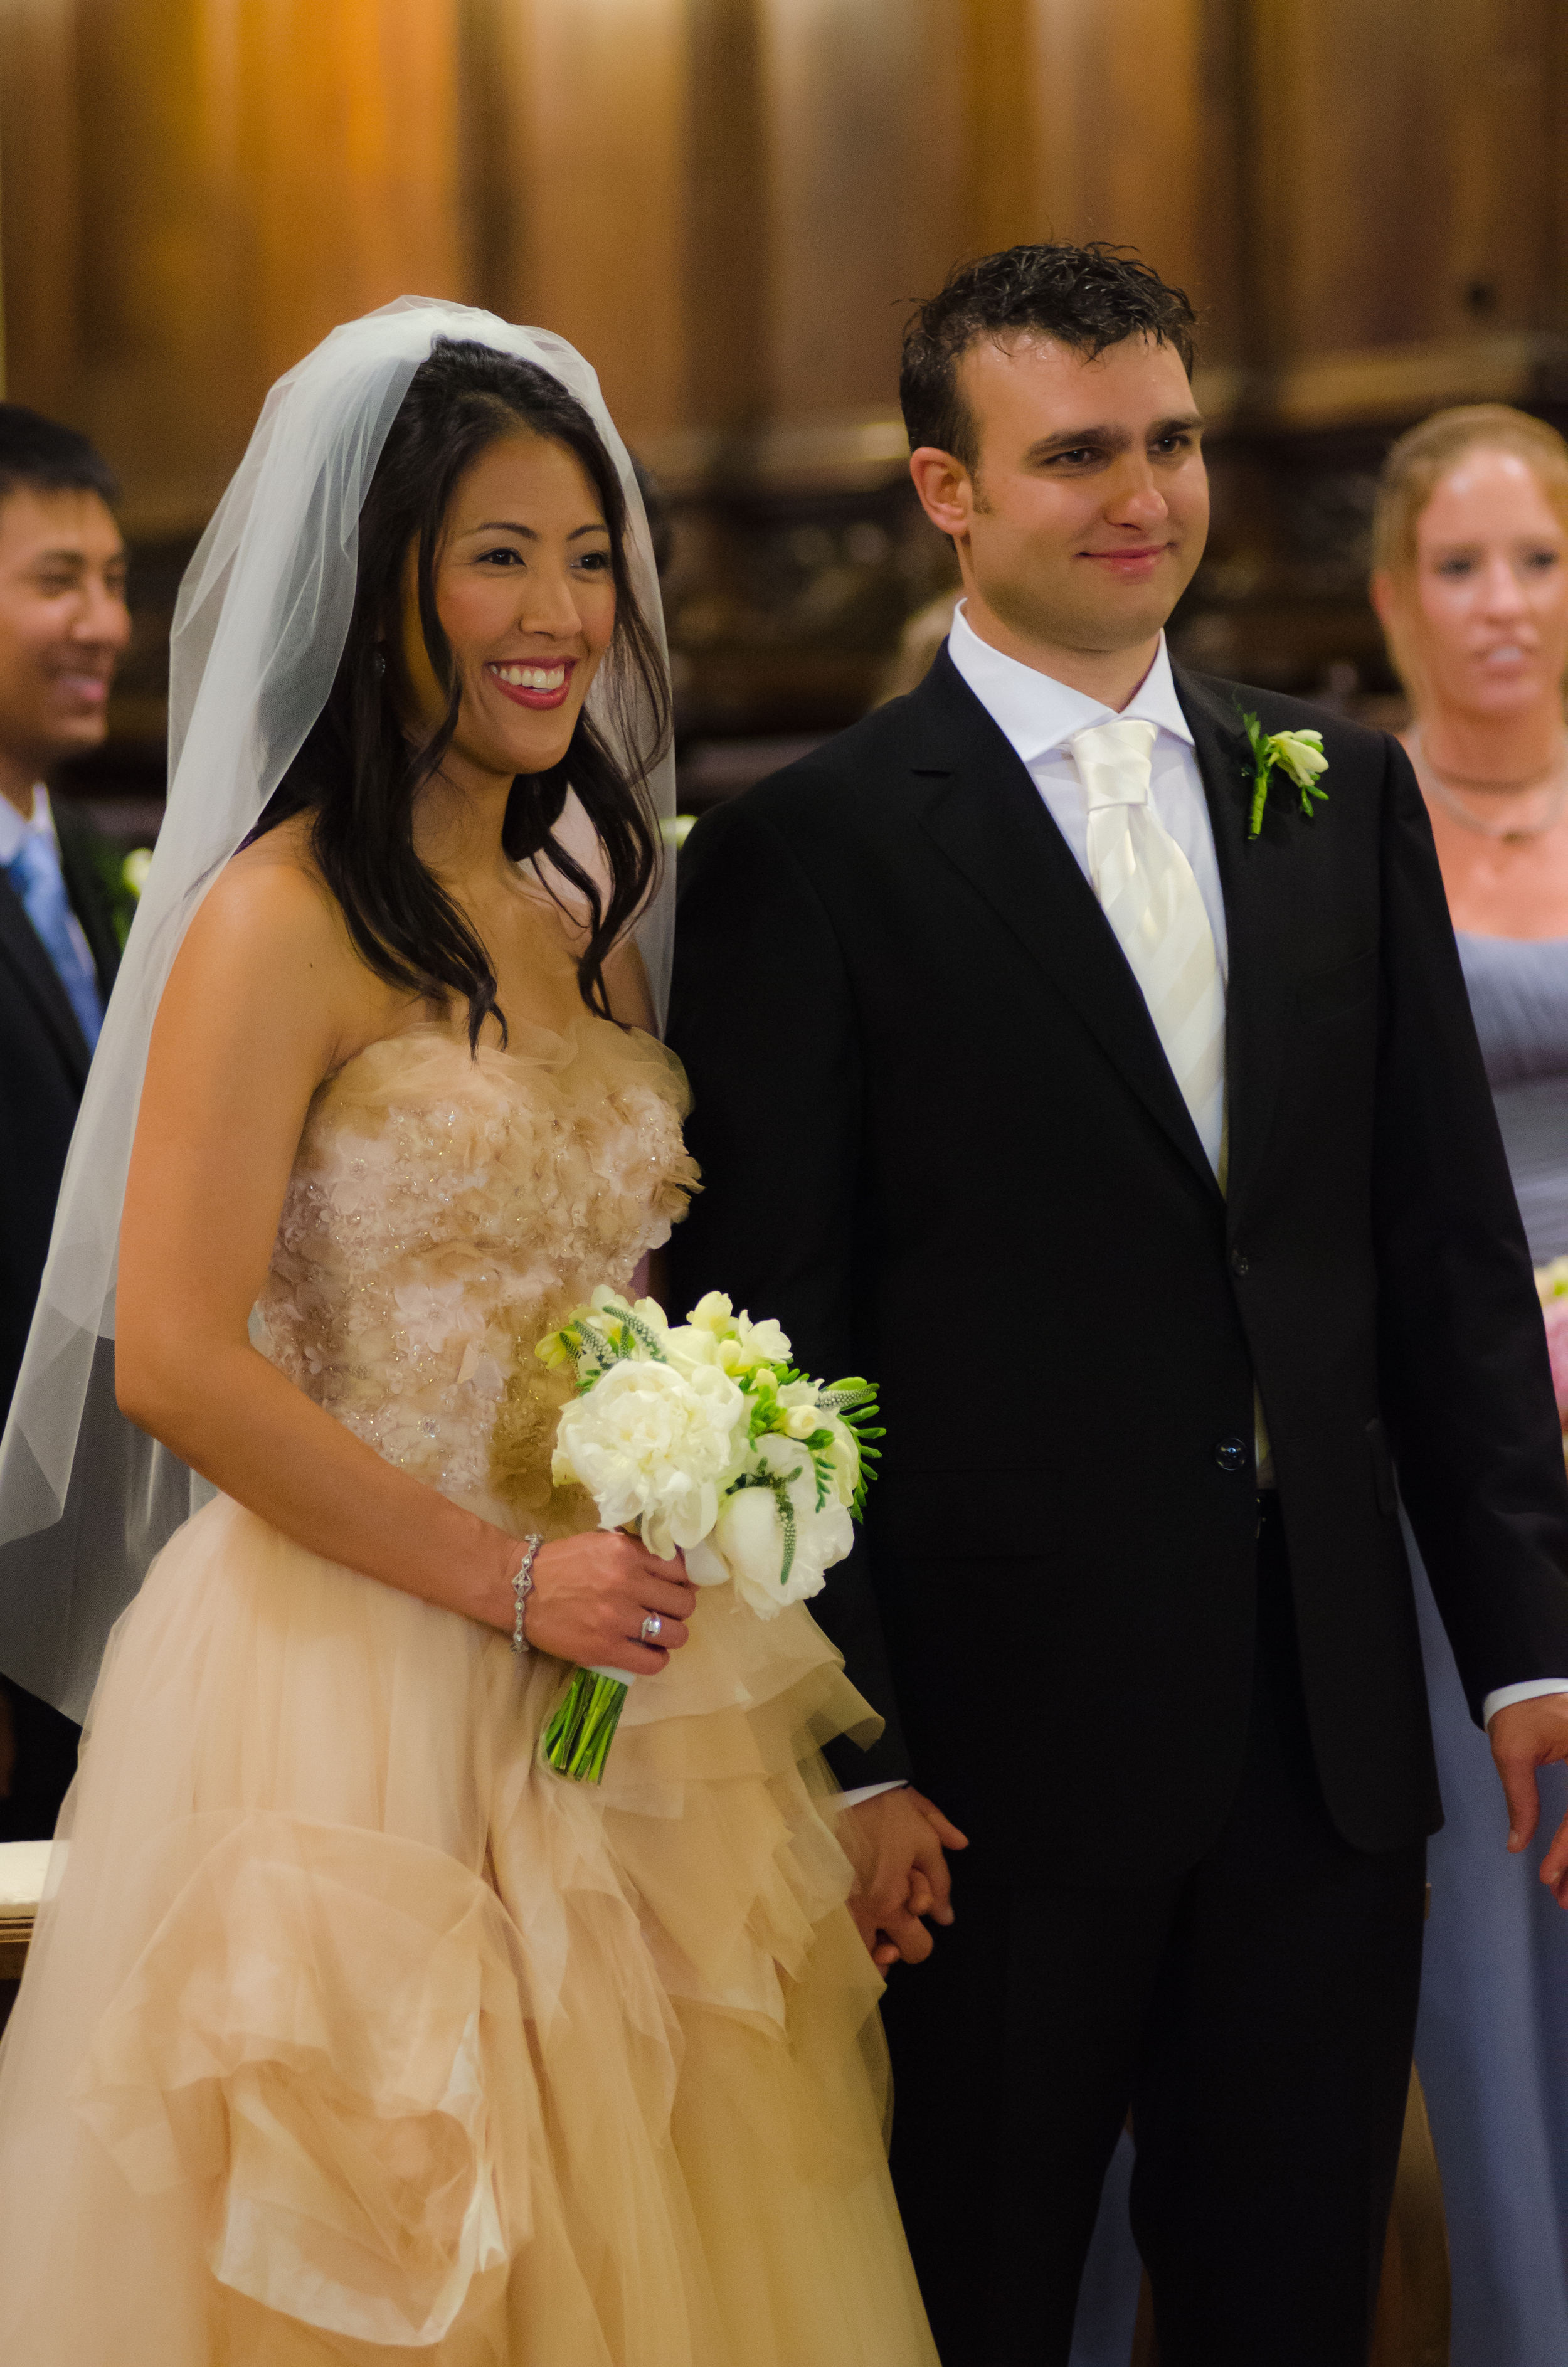 just-married_7537750132_o.jpg